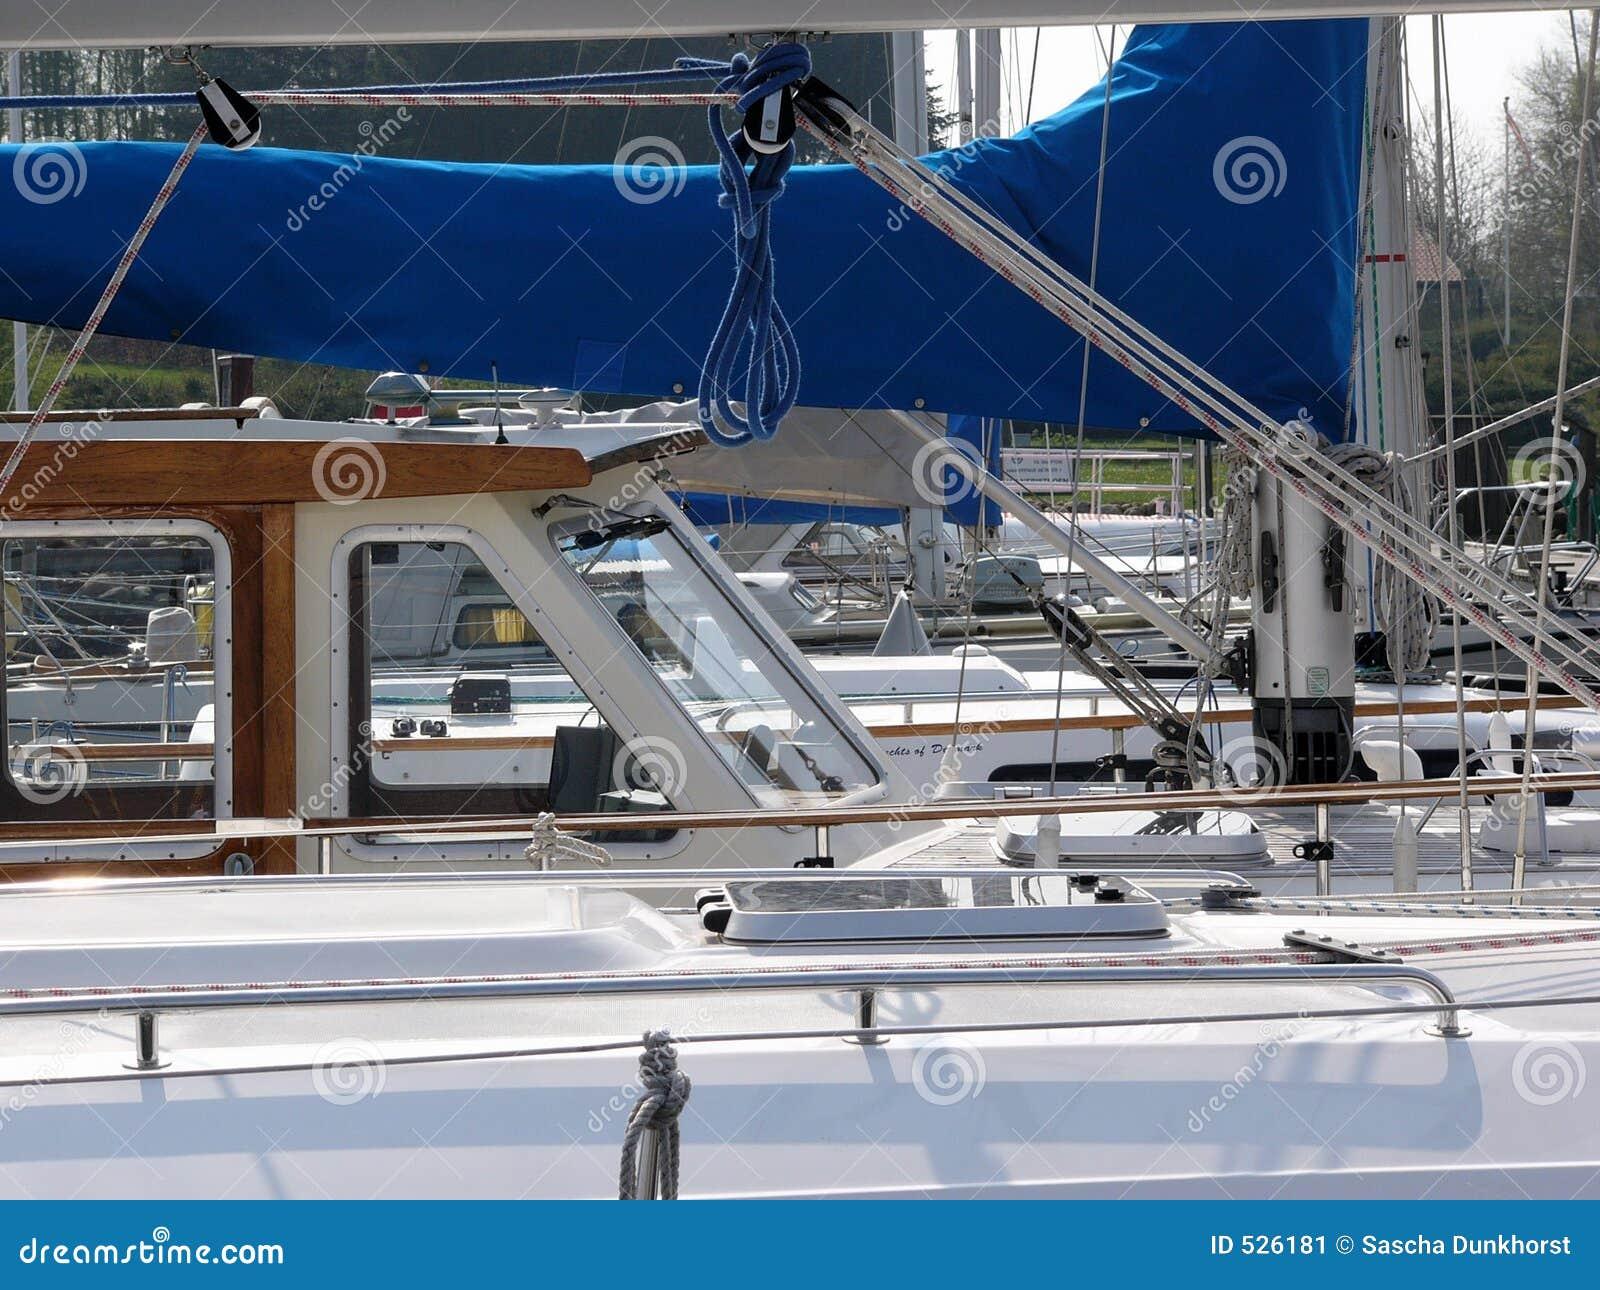 Download 航行 库存图片. 图片 包括有 晴朗, 绳索, 豪华, 富有, 夏天, 空白, 体育运动, 视图, 镀铬物, 甲板 - 526181